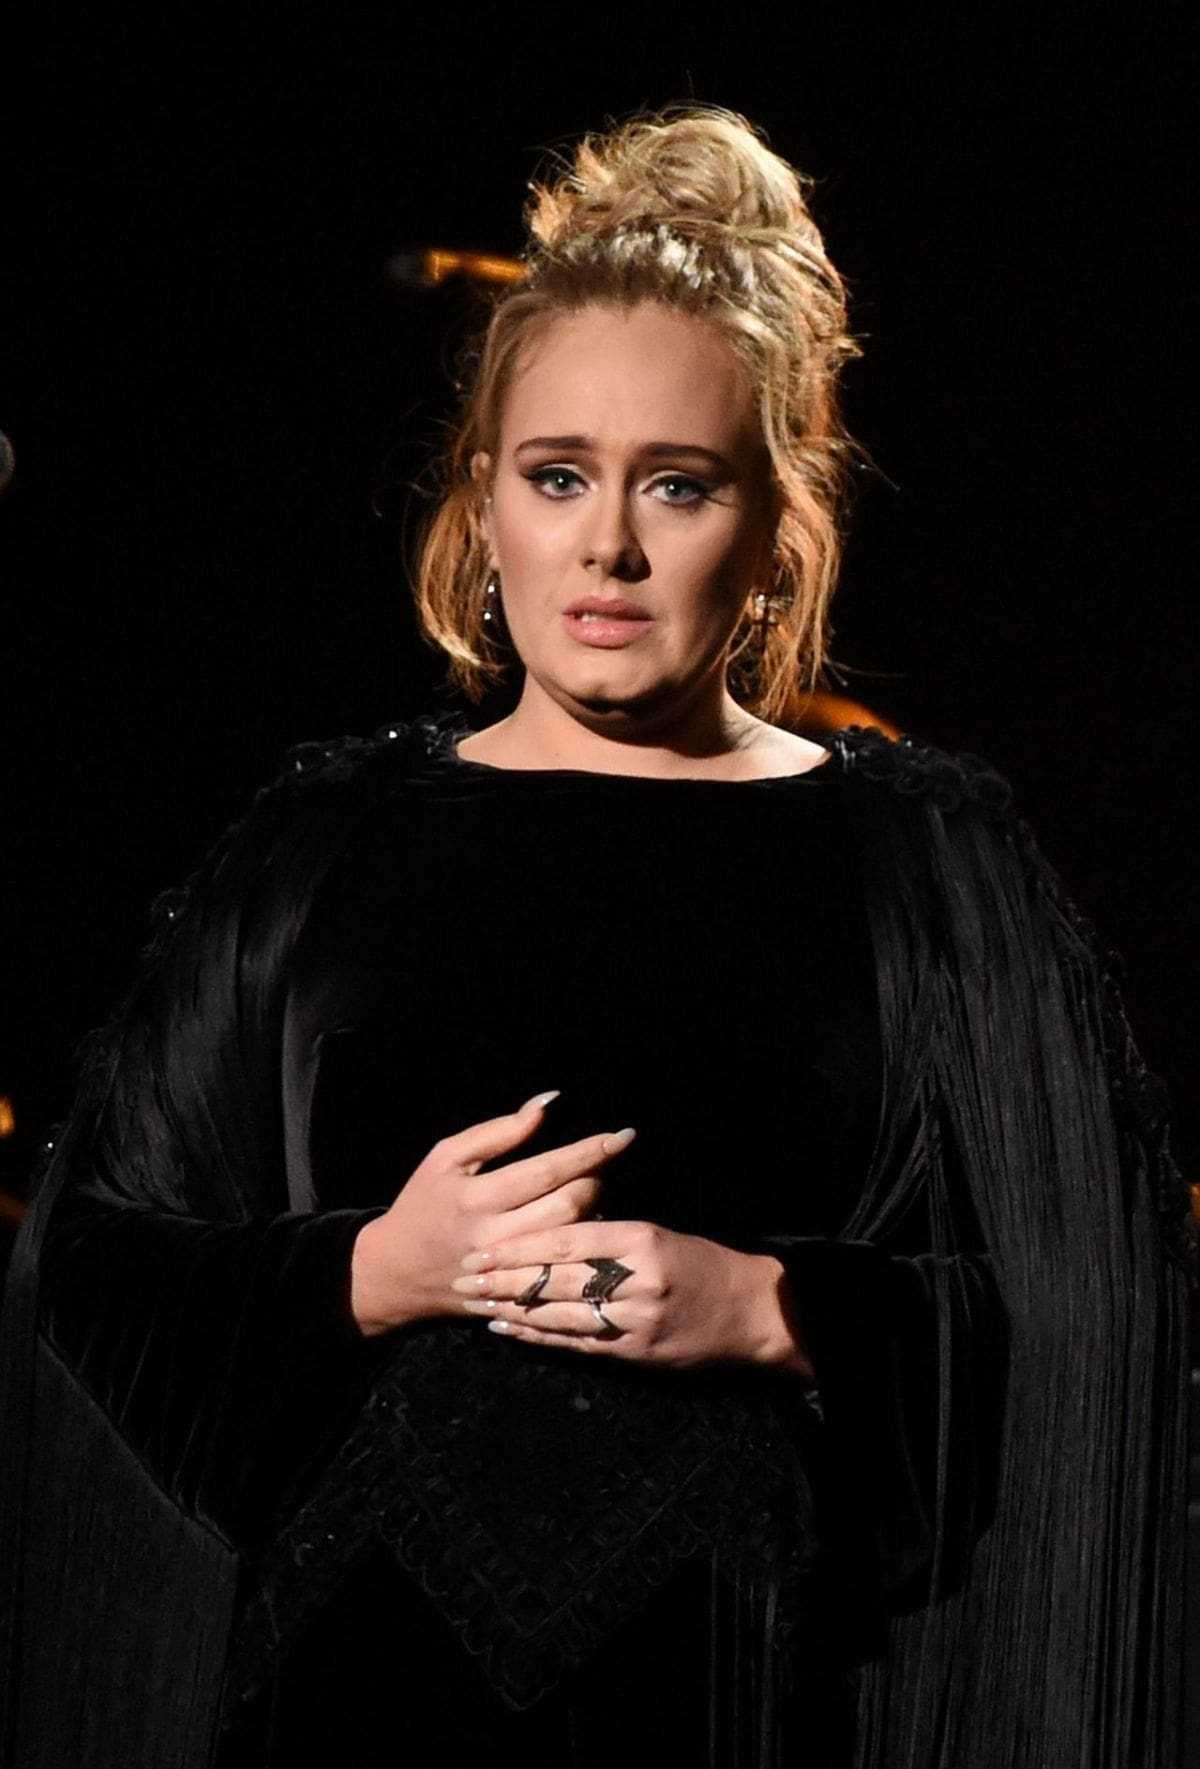 Adele-hair-beautiful